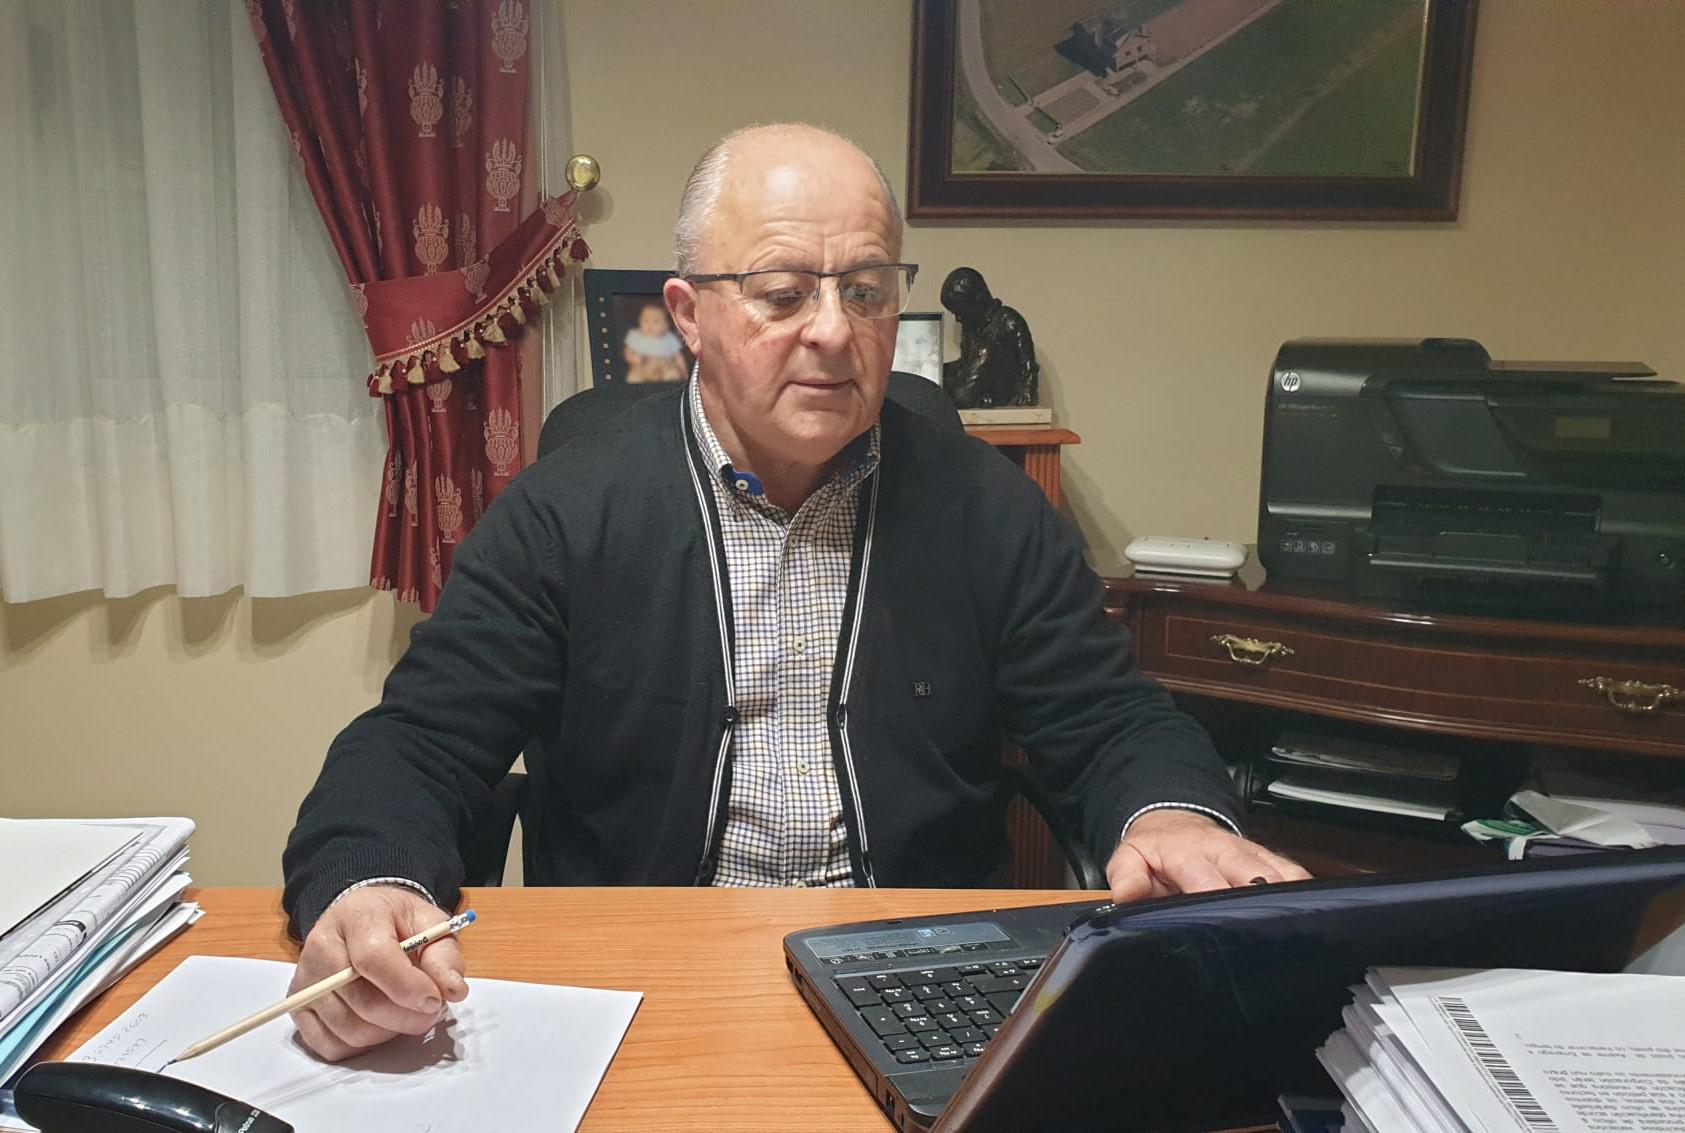 O PP de Ribadeo reivindica o acondicionamento do Grupo San Miguel e Justo Barreiro